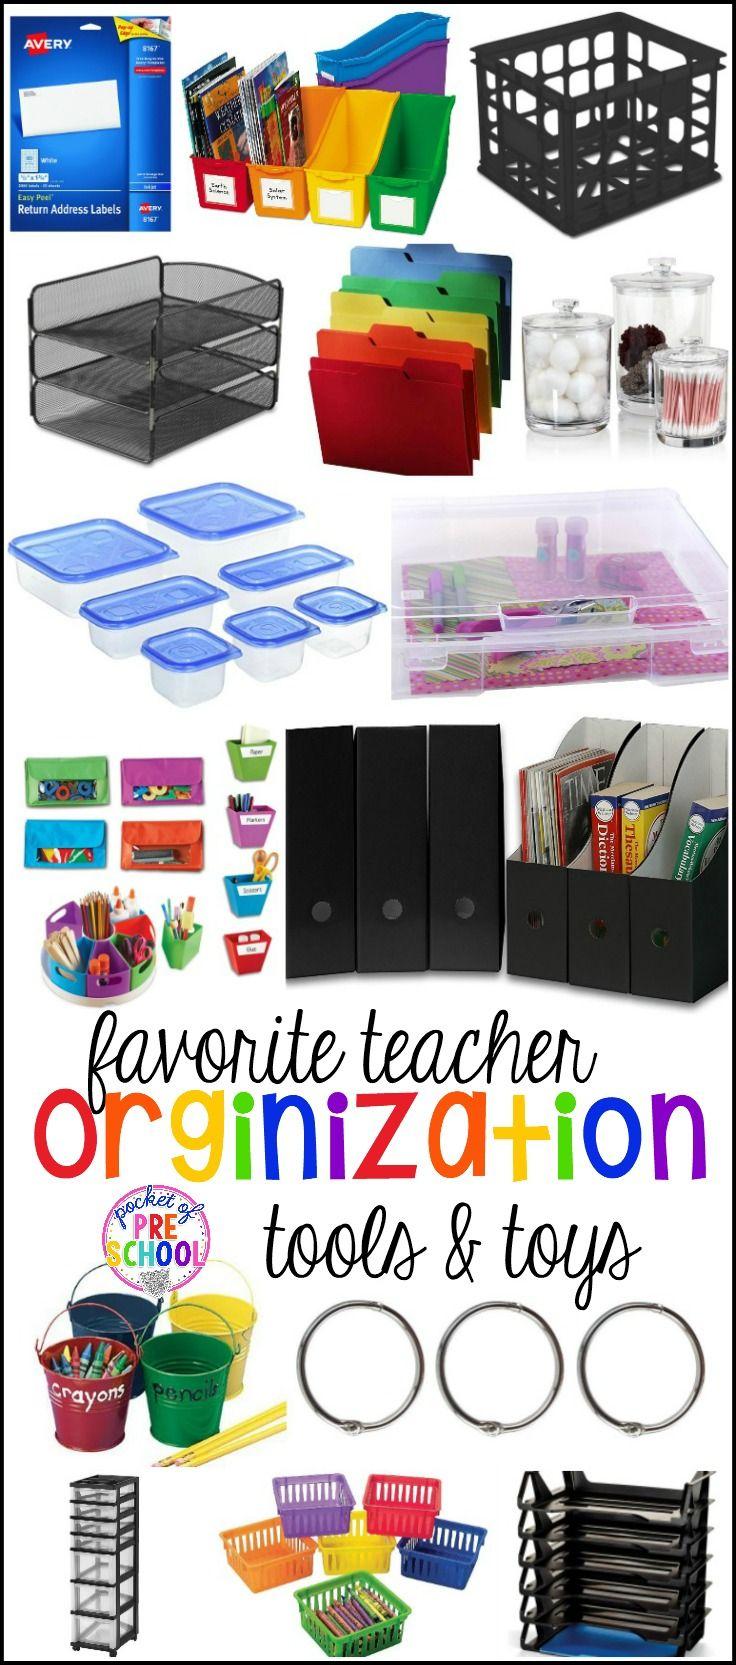 Favorite Teacher Organization Tools and Toys for Preschool and Kindergarten - Pocket of Preschool